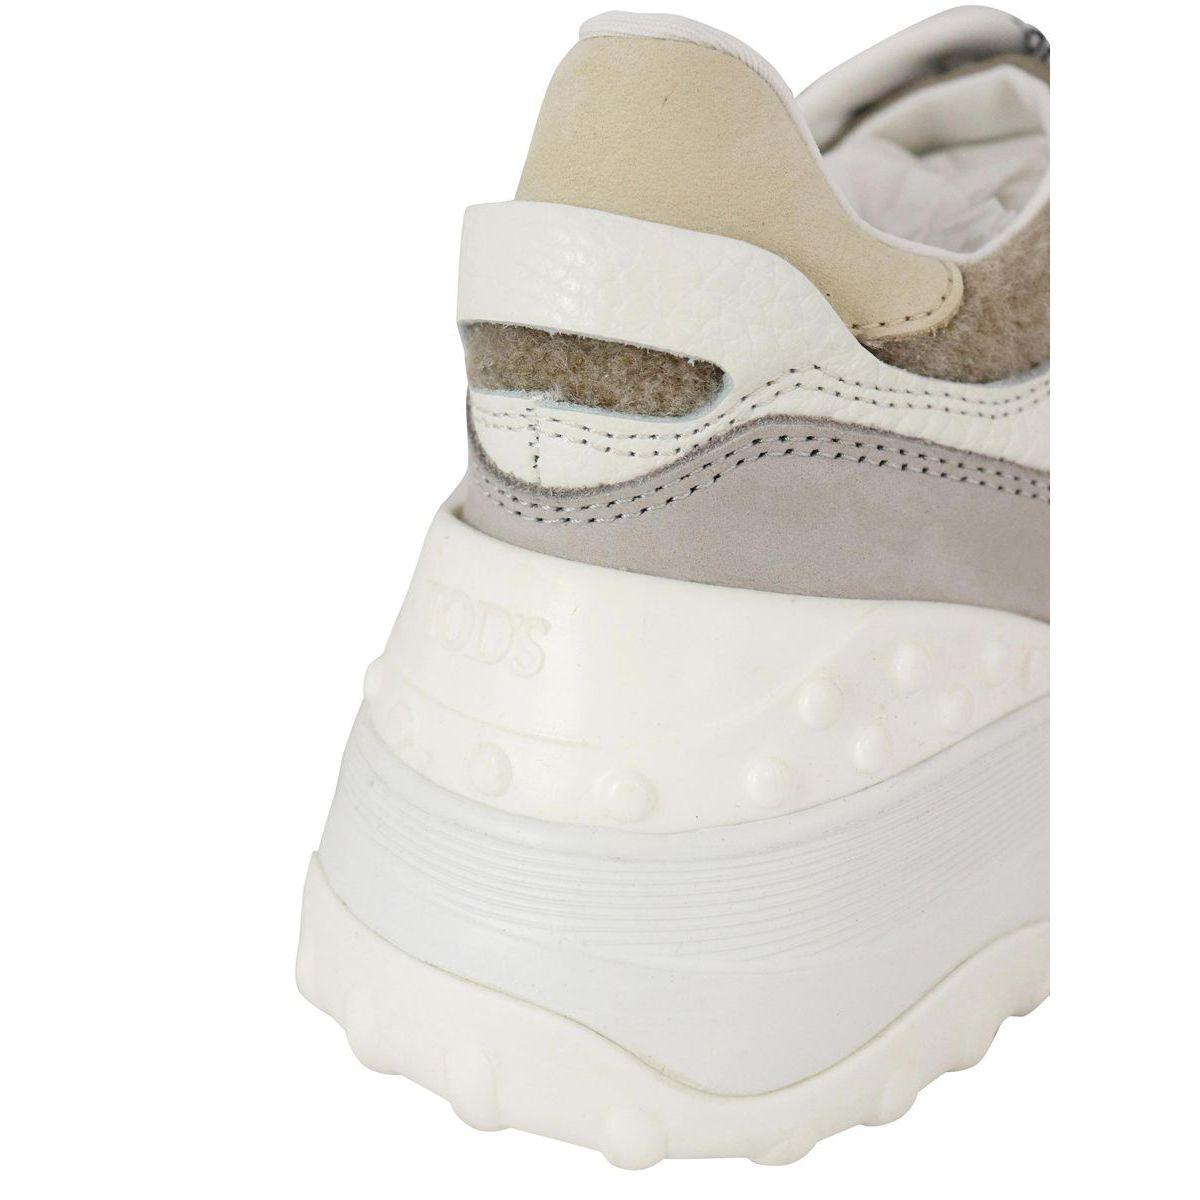 45B sports bottom sneaker White / ecru Tod's